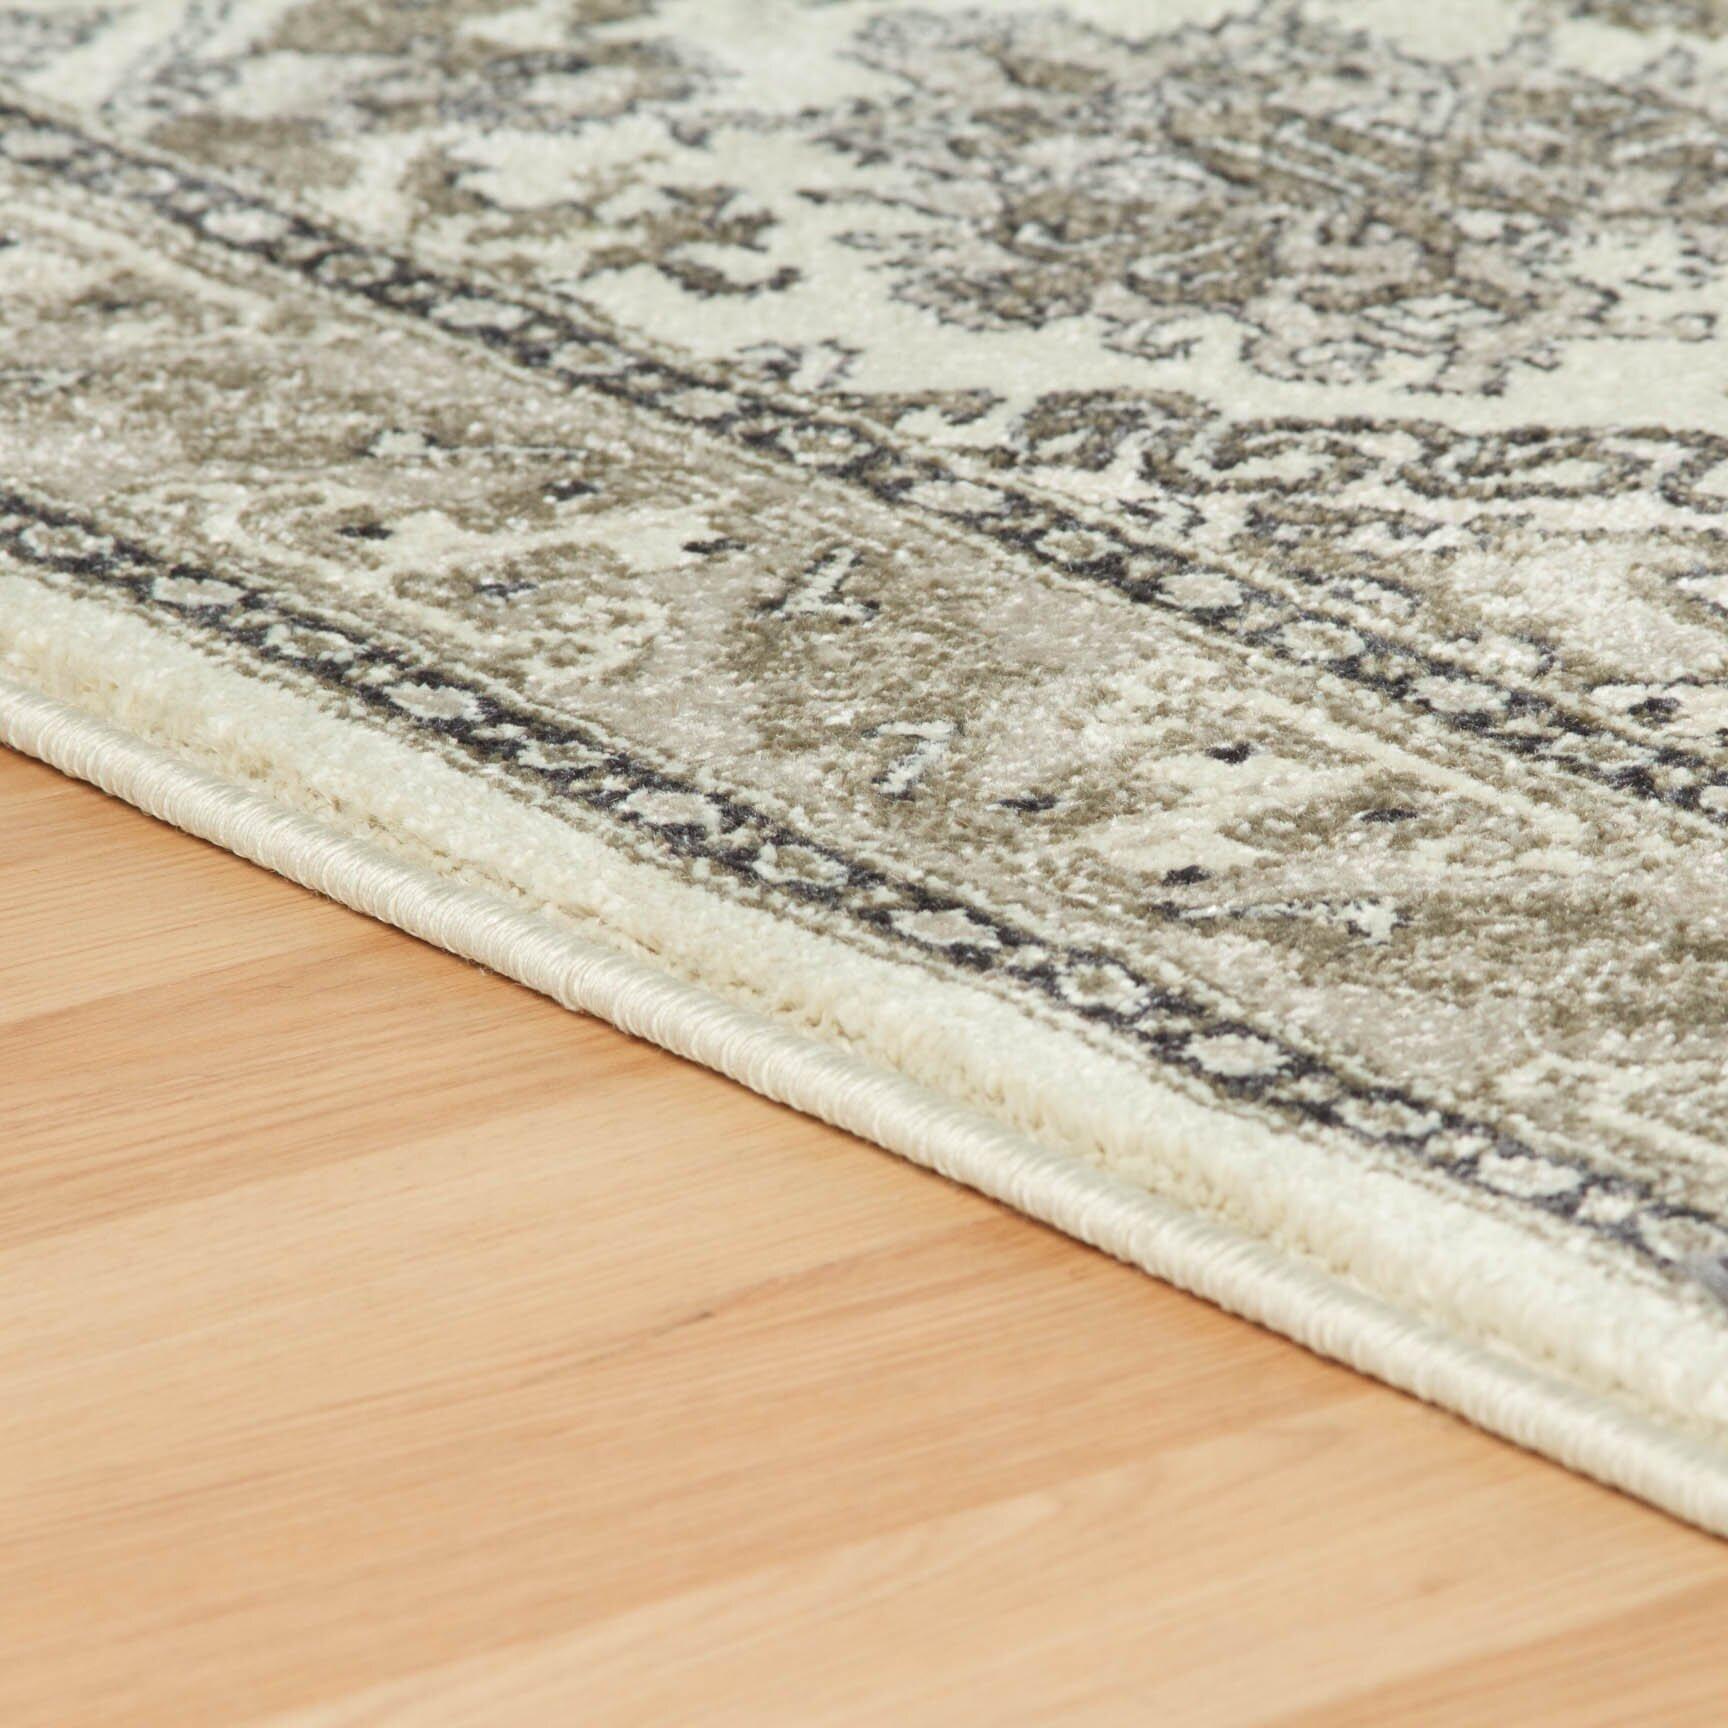 oriental weavers teppich richmond in creme grau. Black Bedroom Furniture Sets. Home Design Ideas